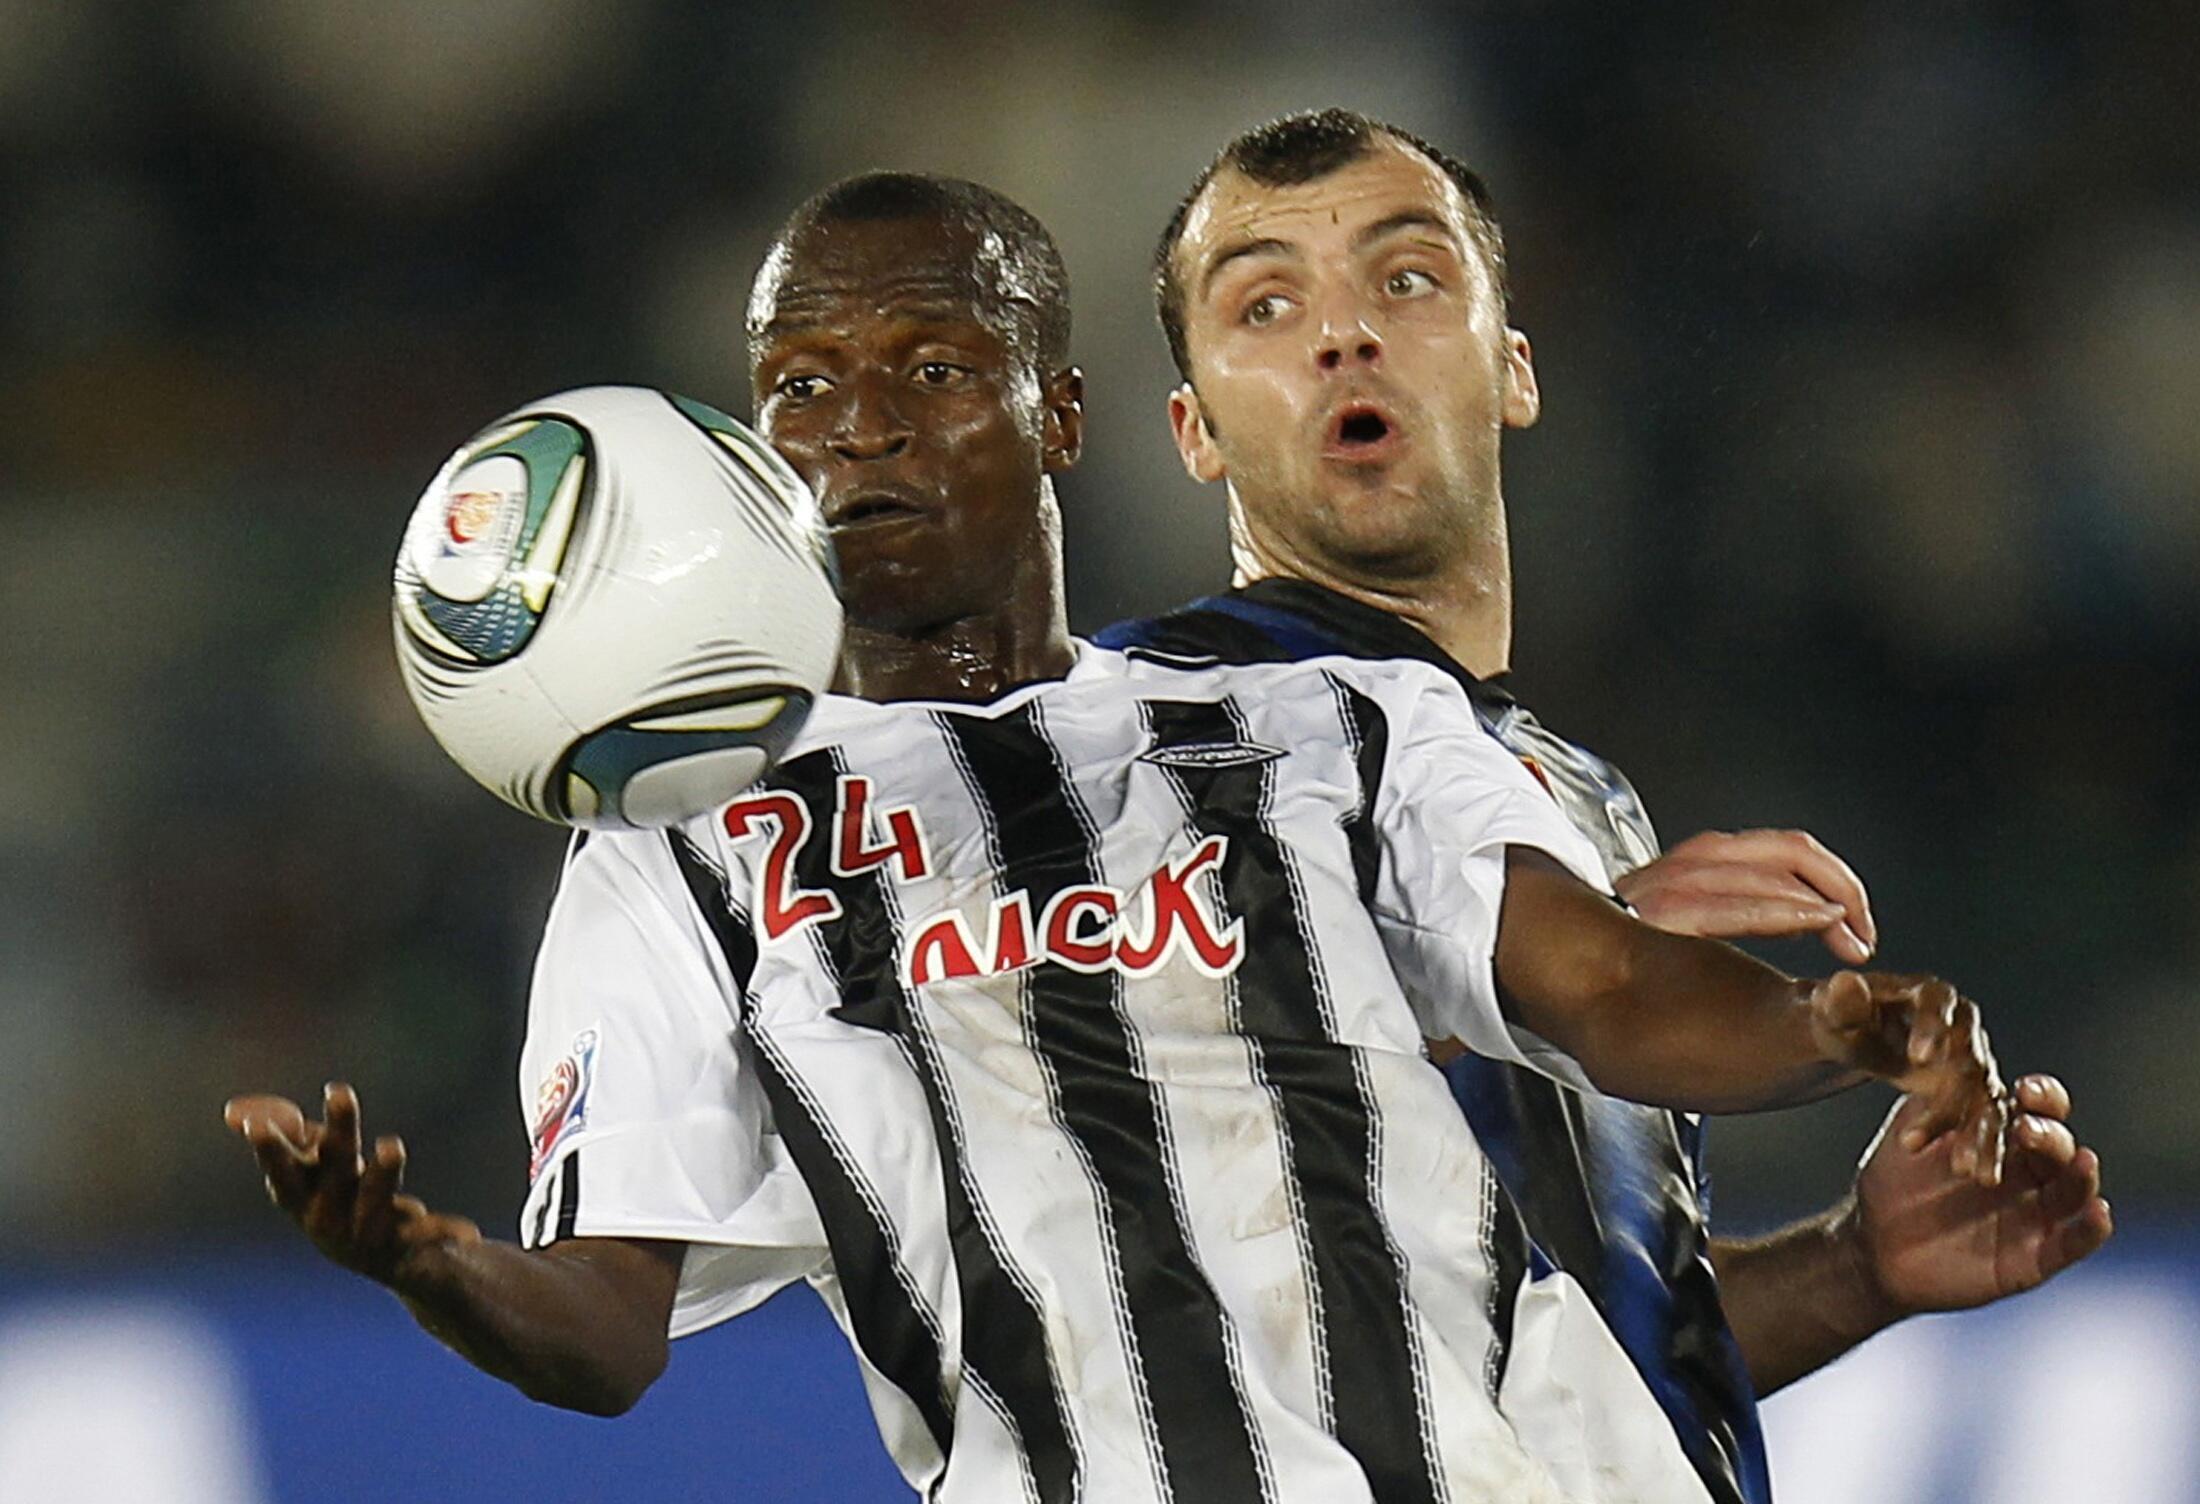 Amia Ekanga devance Goran Pandev mais les Congolais n'ont pas pu rivaliser avec l'Inter